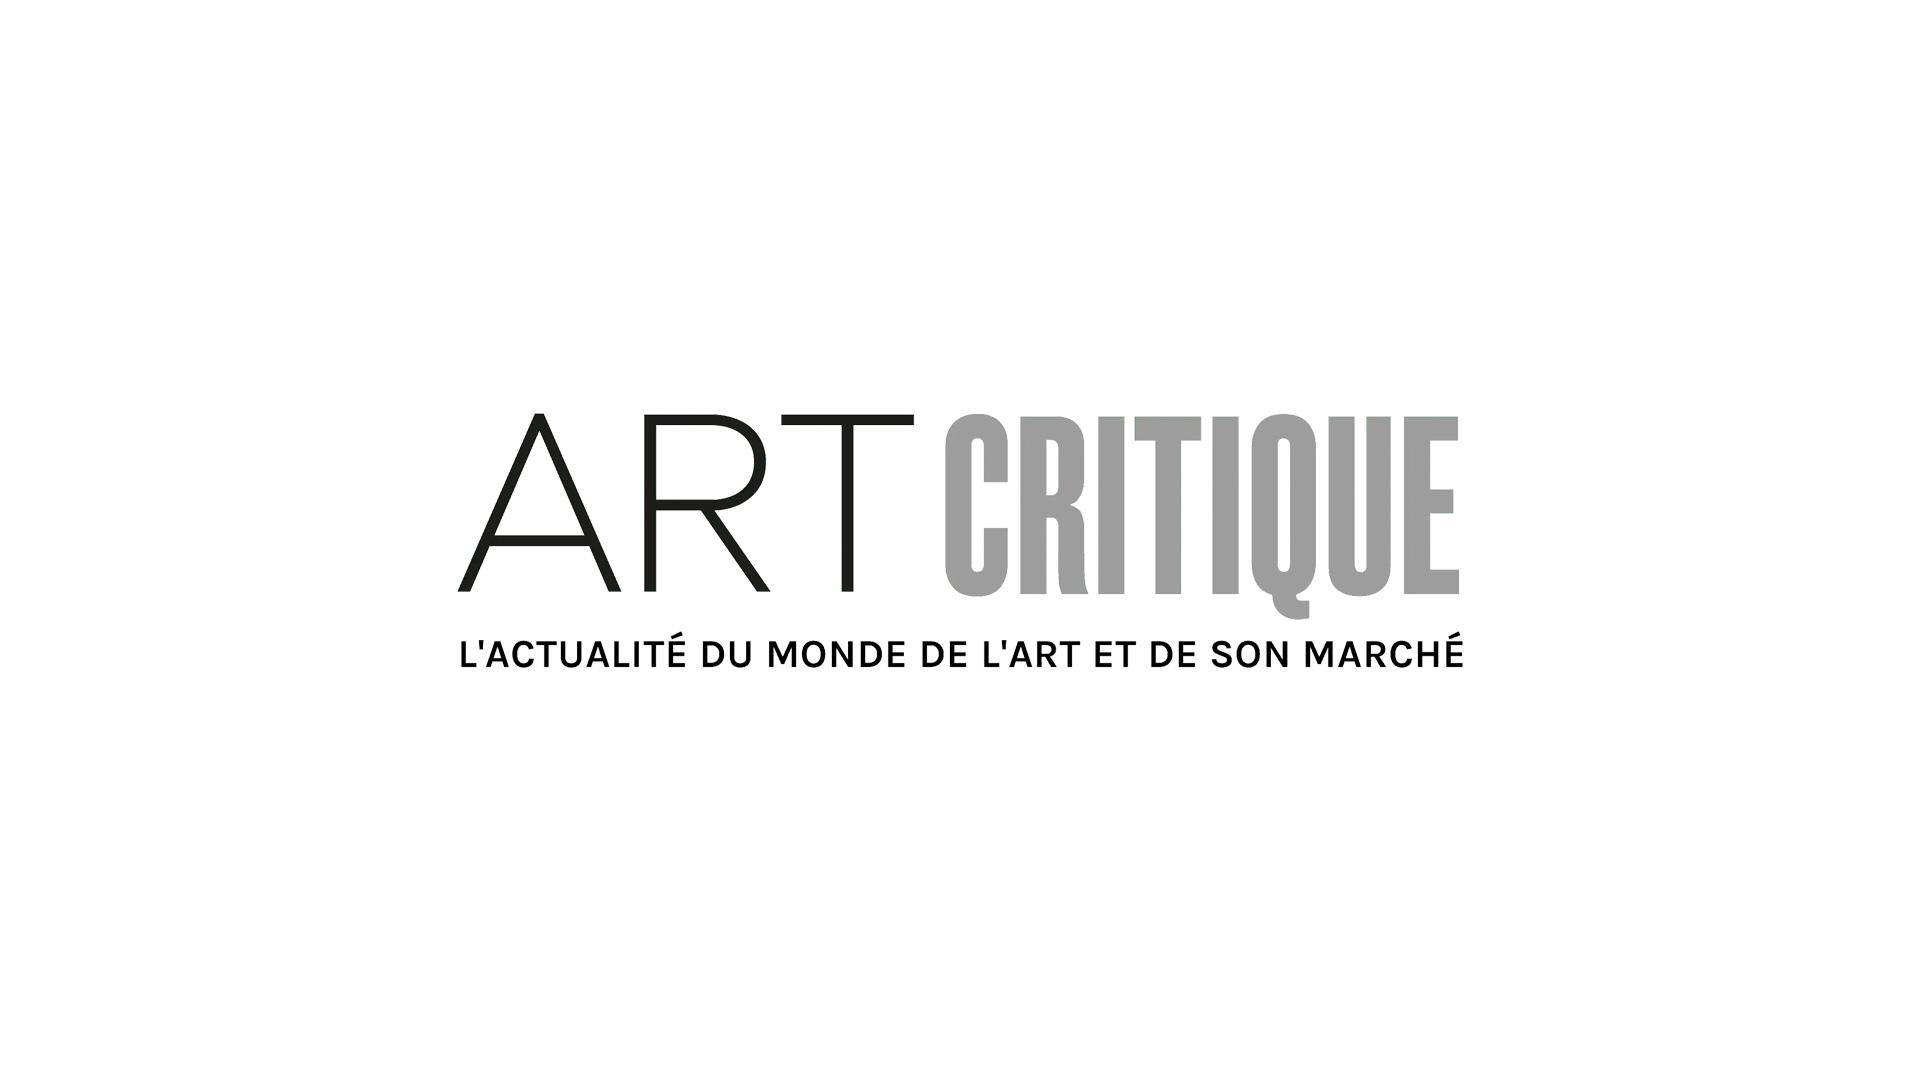 Egypt tries to halt the sale of a statue resembling Tutankhamun